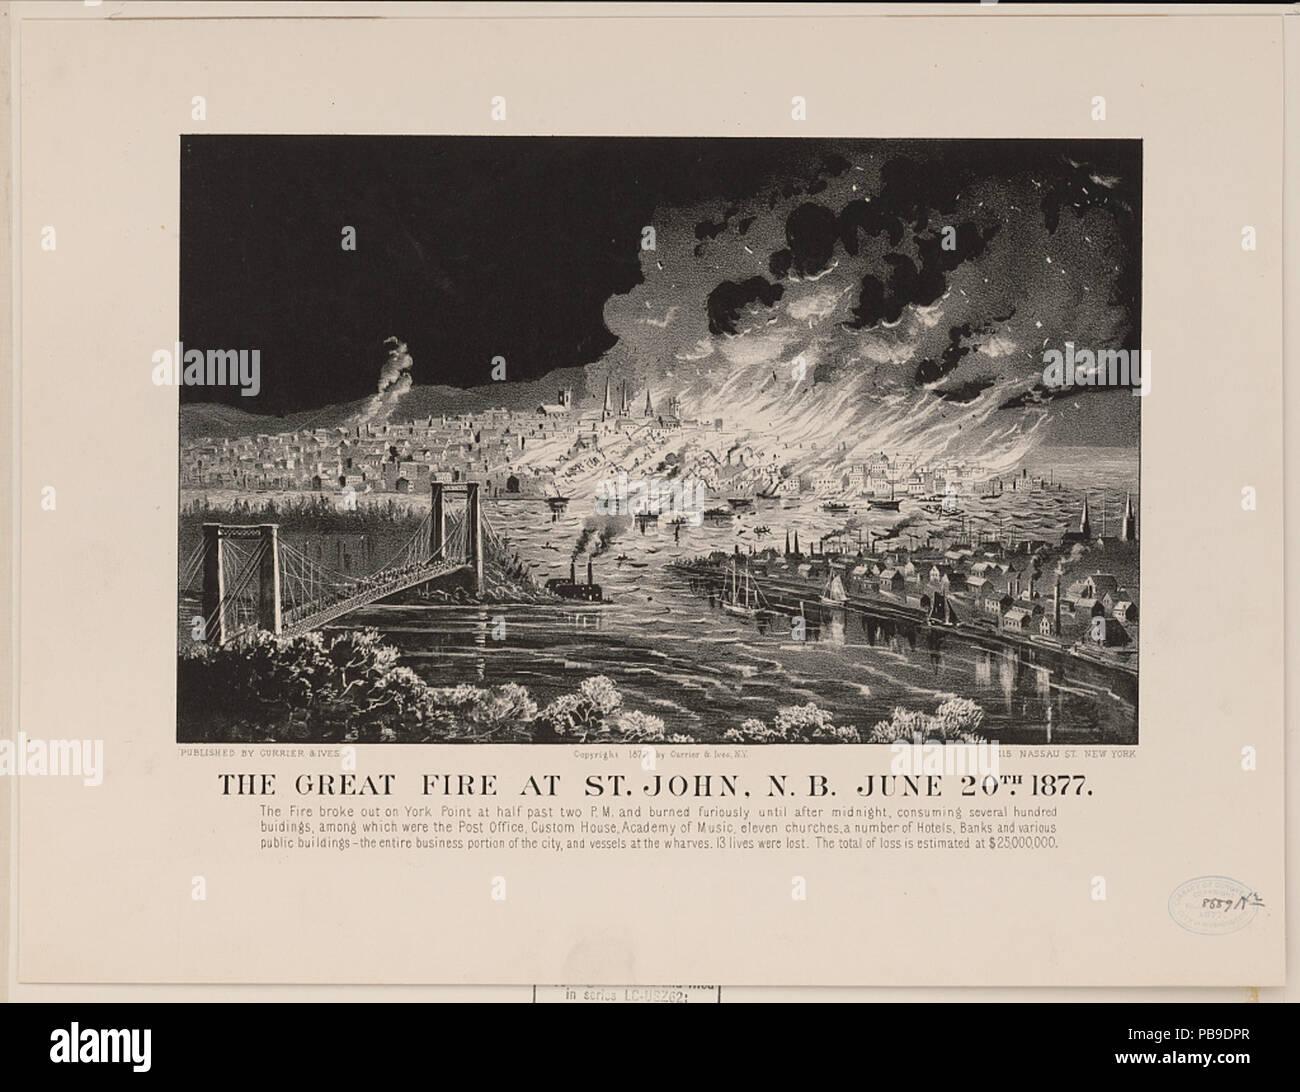 The Great Fire at Saint John, June 20, 1877